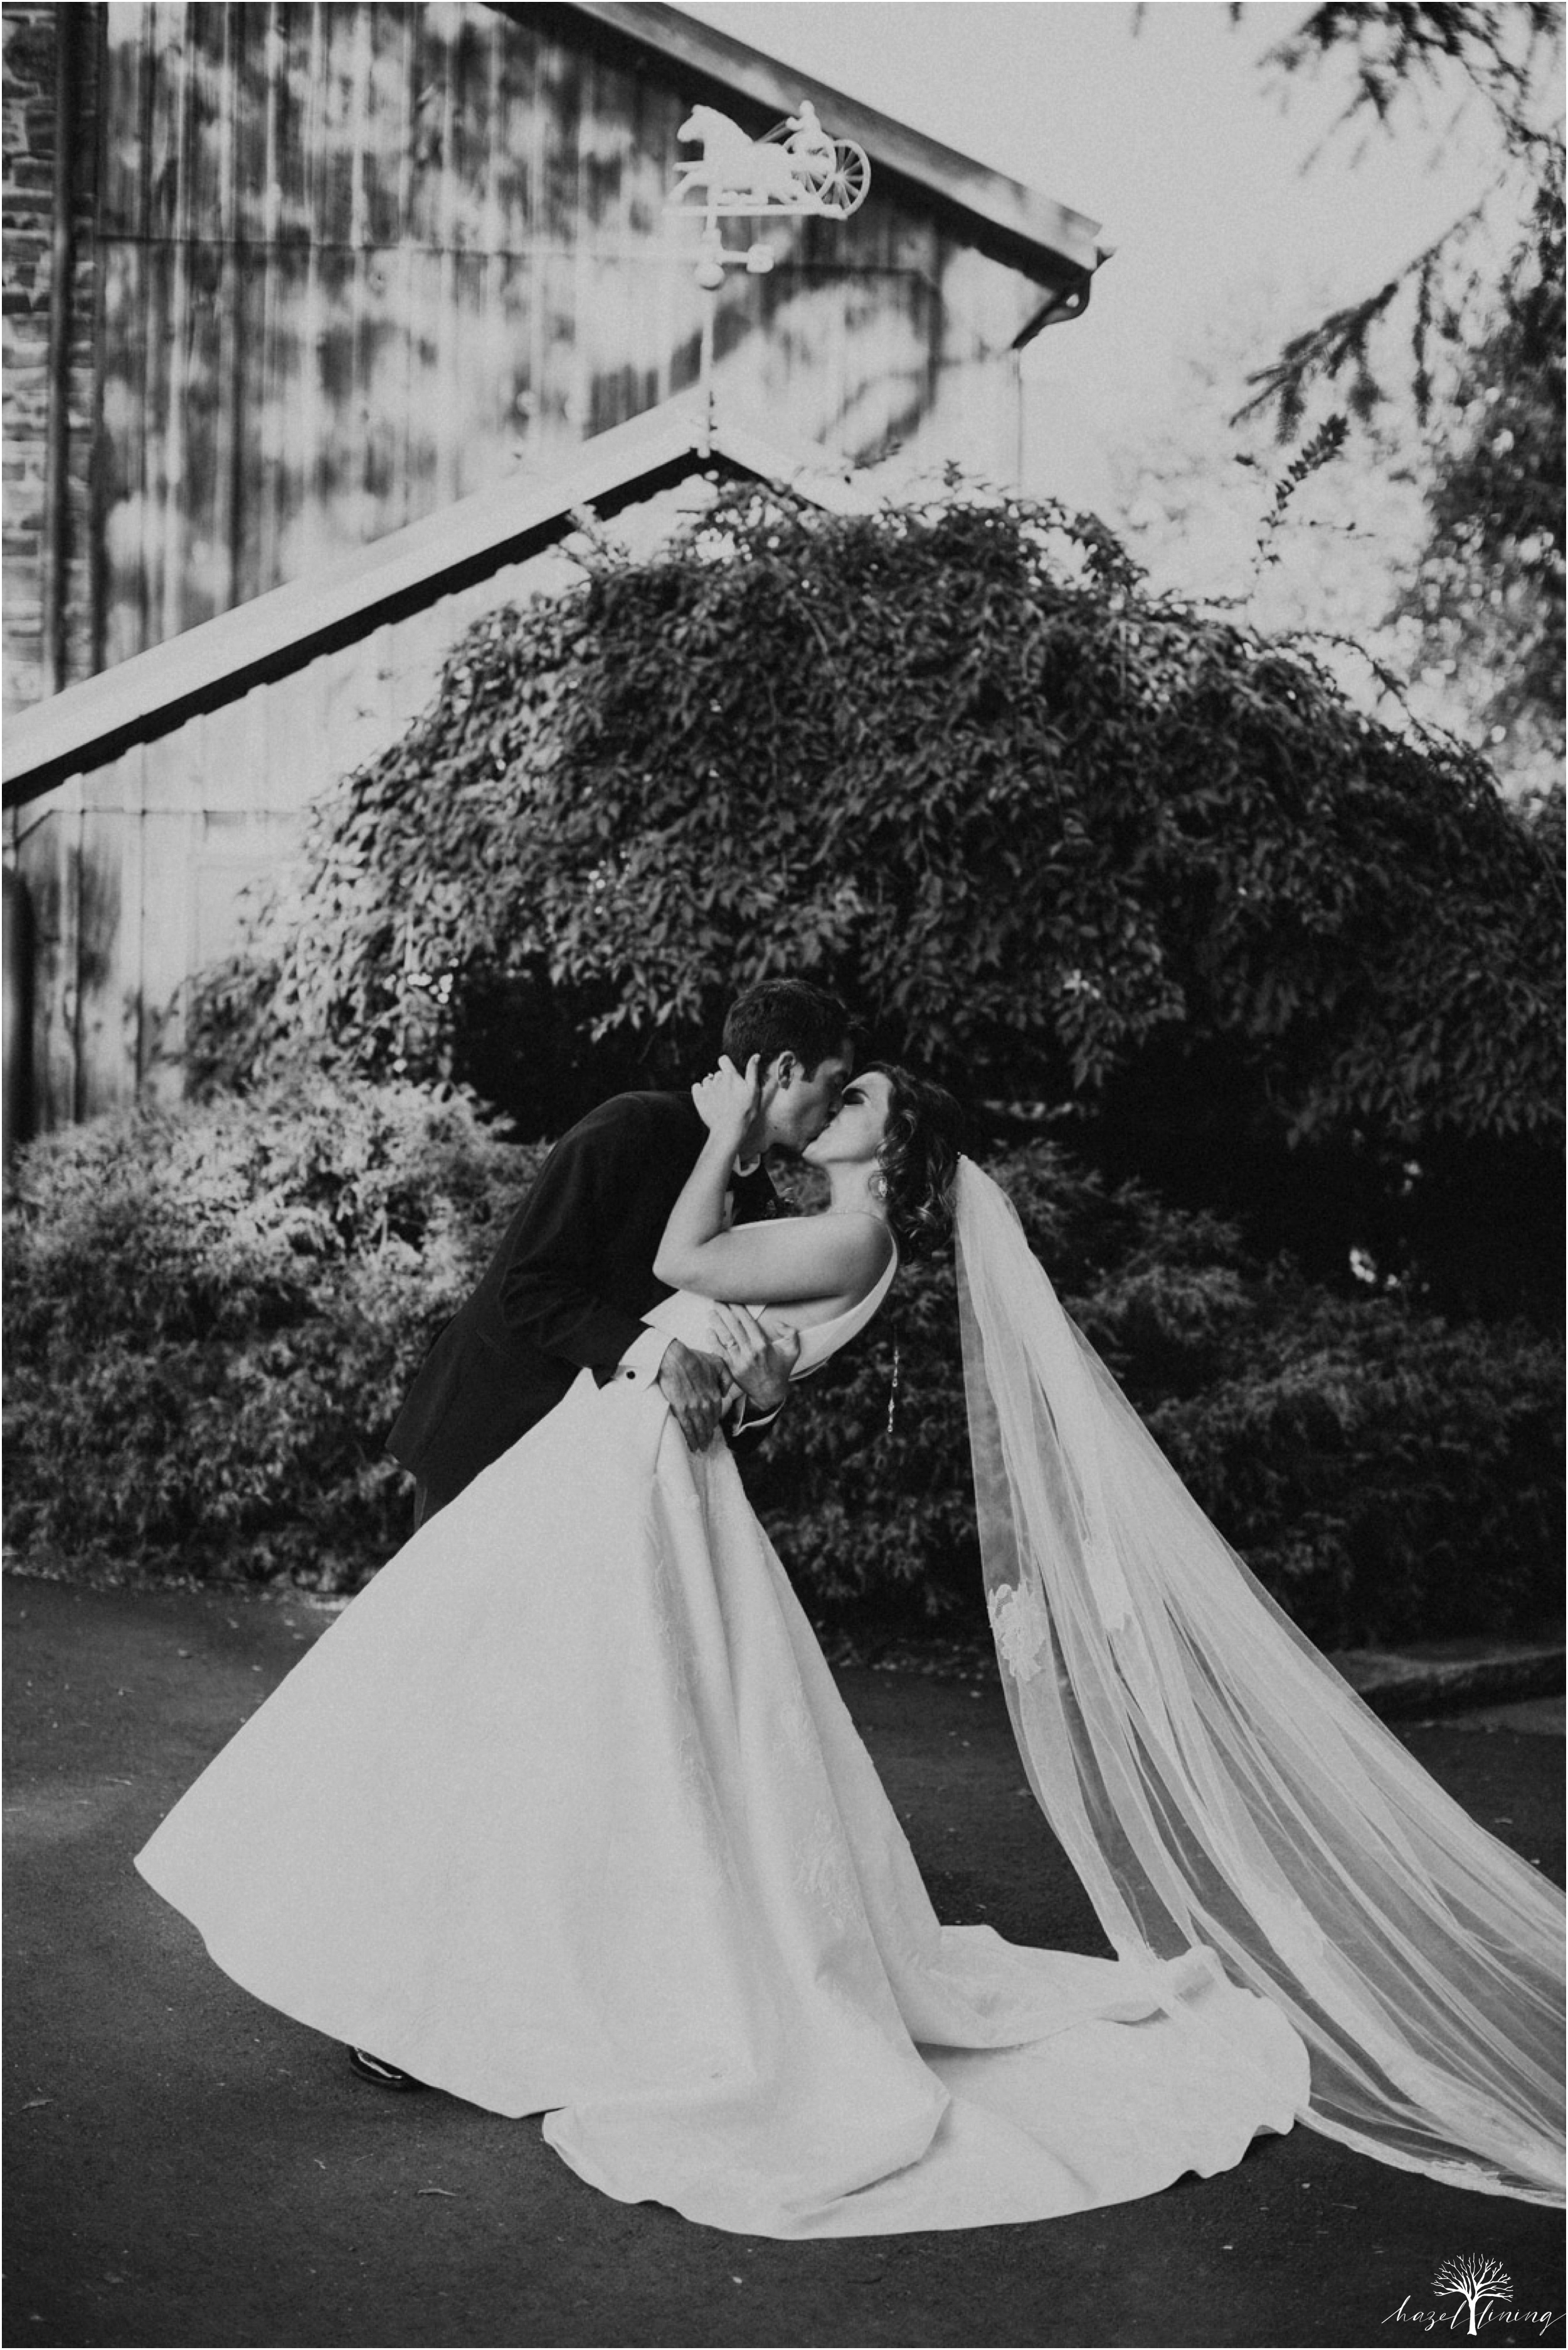 maureen-hepner-anthony-giordano-rose-bank-winery-newtow-pennsylvania-luxury-summer-wedding-hazel-lining-photography-destination-elopement-wedding-engagement-photography_0108.jpg